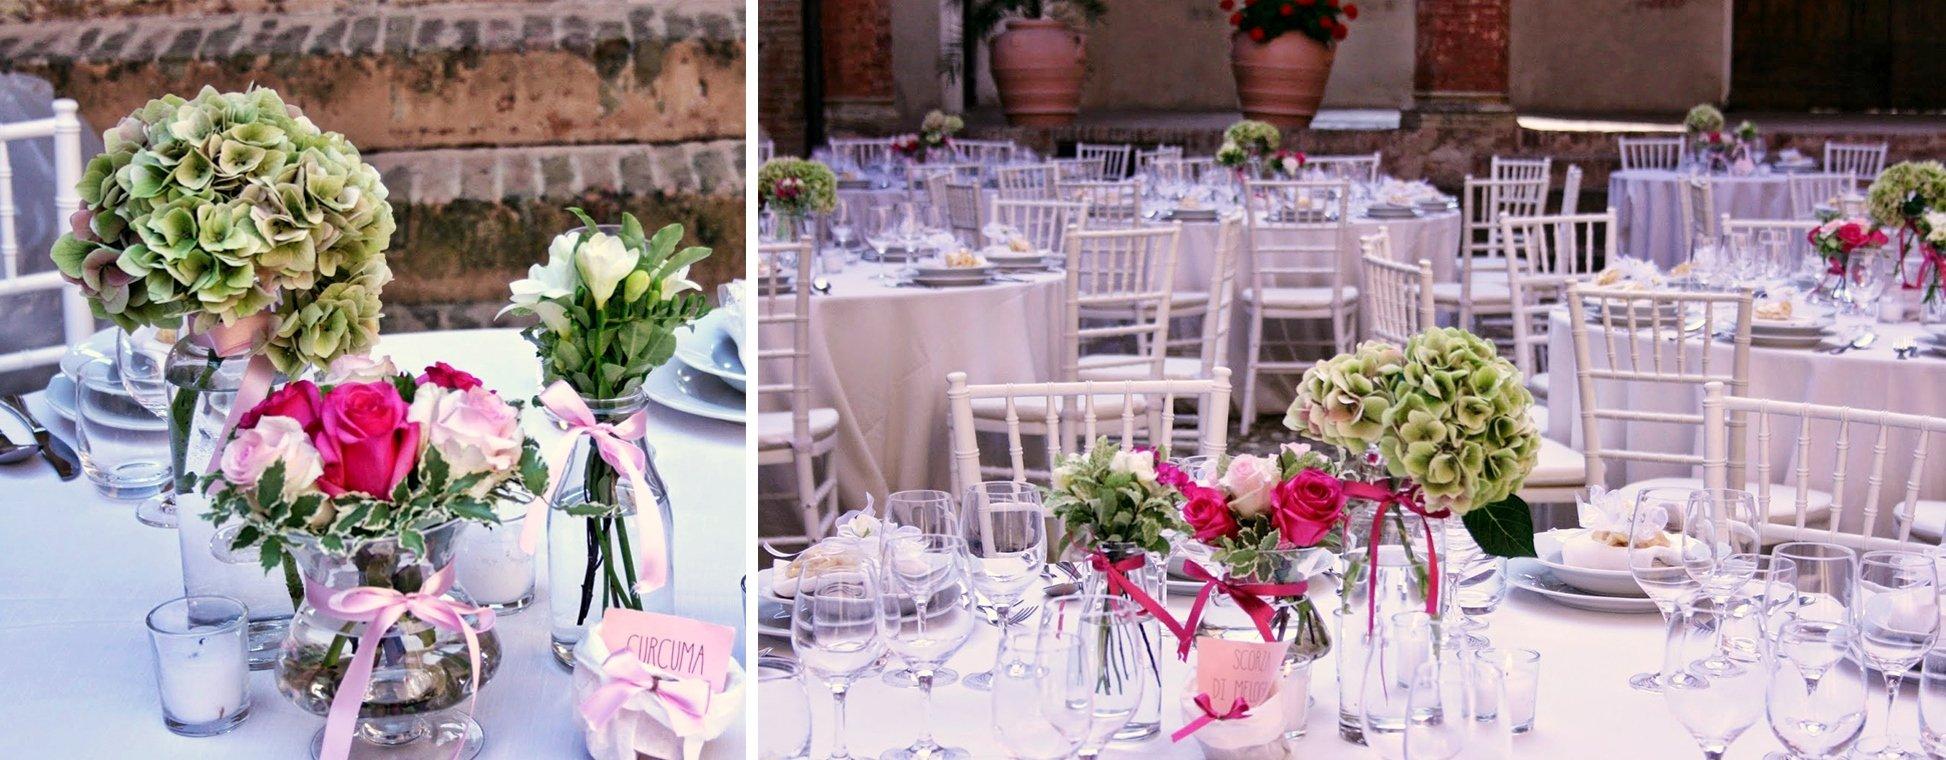 Matrimonio Tema Juta : Wedding time i matrimoni di oui a casa ro